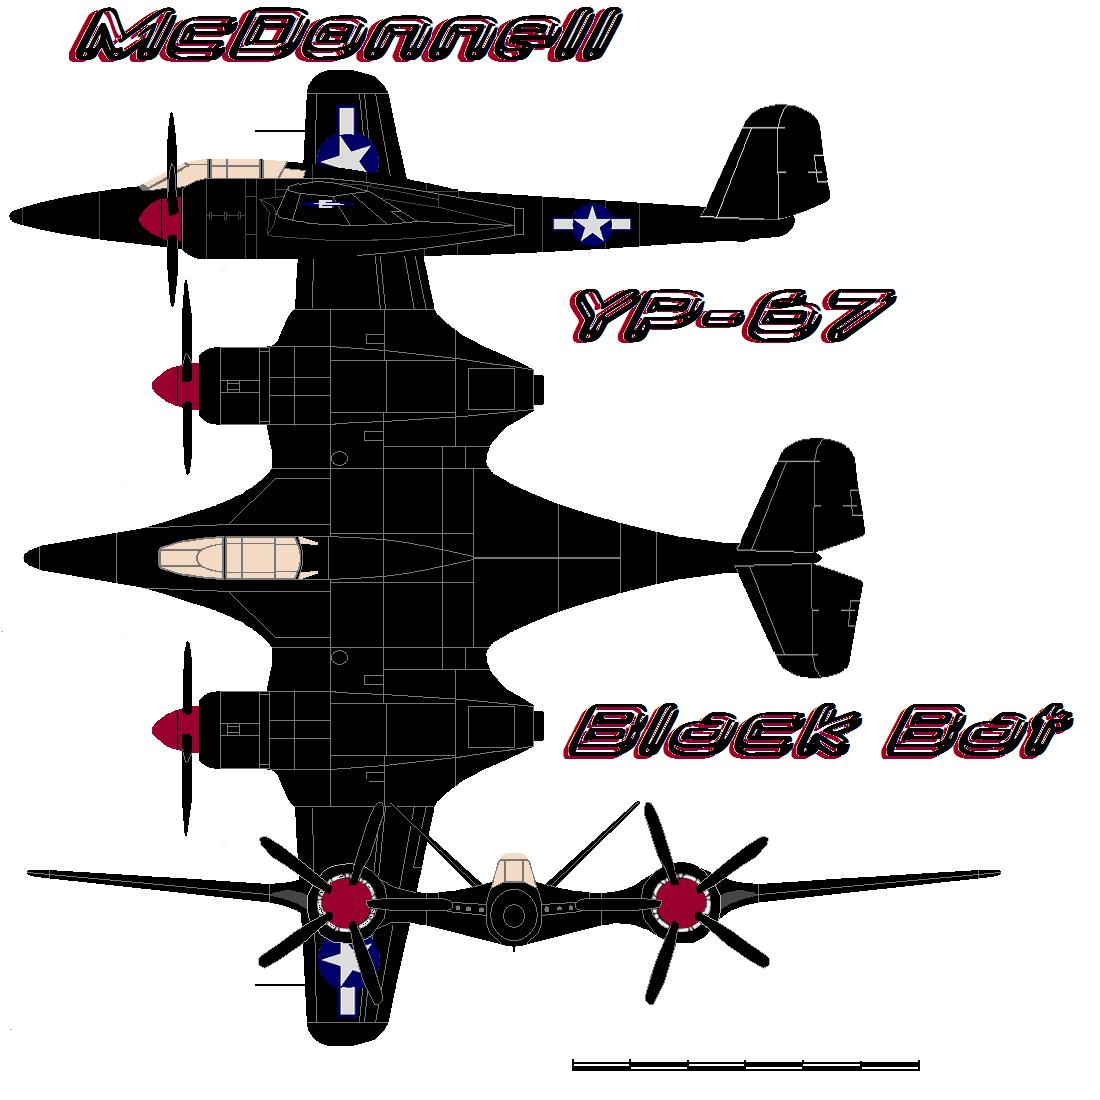 McDonnellYP-67BlackBat.png